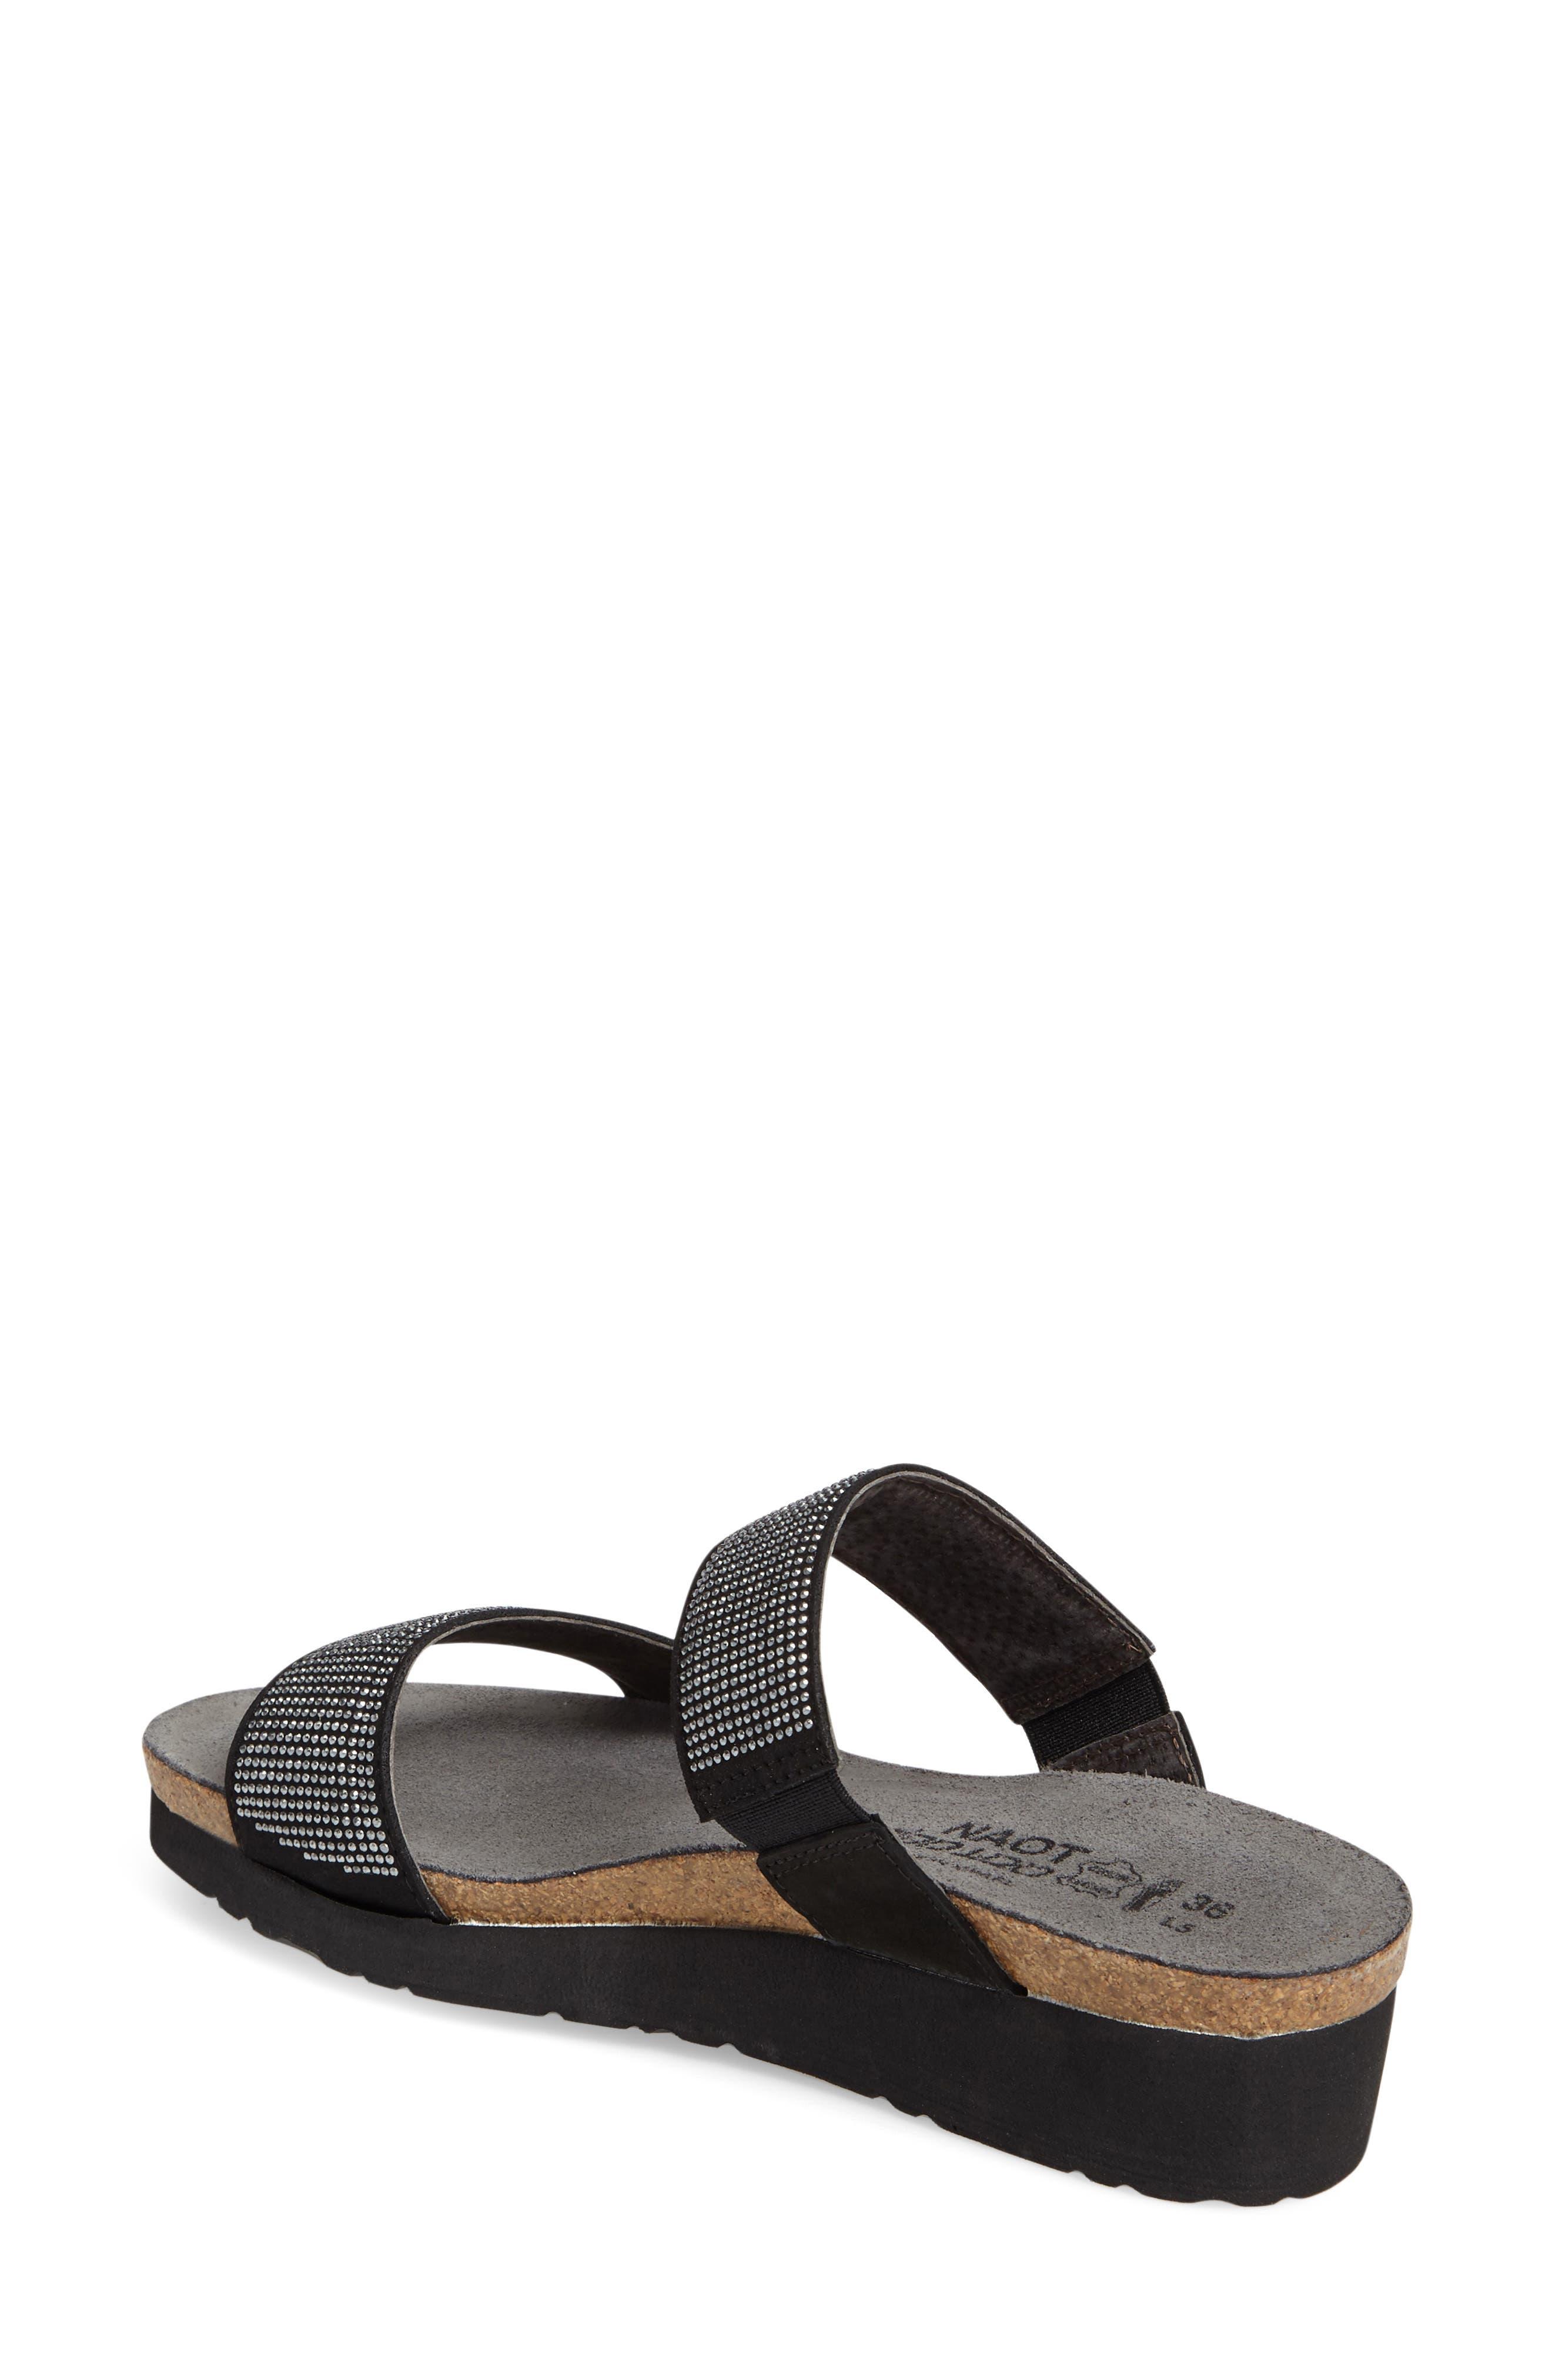 'Bianca' Slide Sandal,                             Alternate thumbnail 2, color,                             BLACK LEATHER